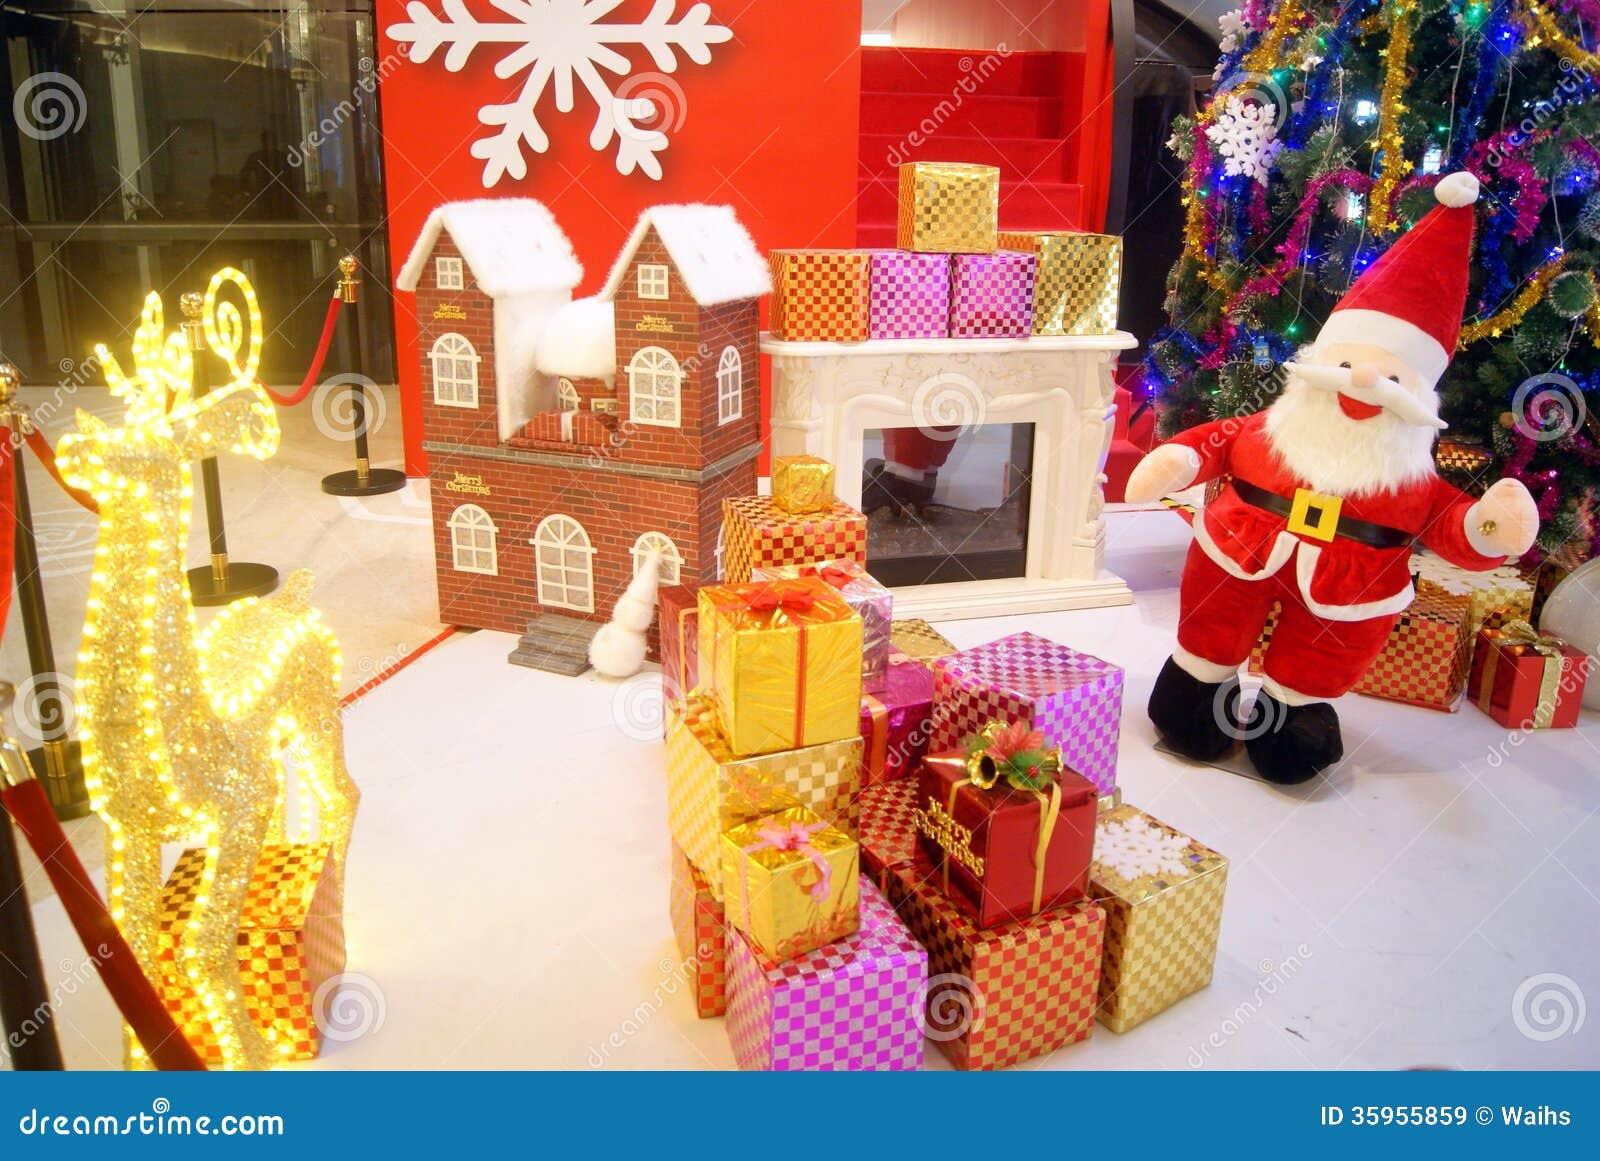 Santa Claus Christmas Gift Royalty Free Stock Images